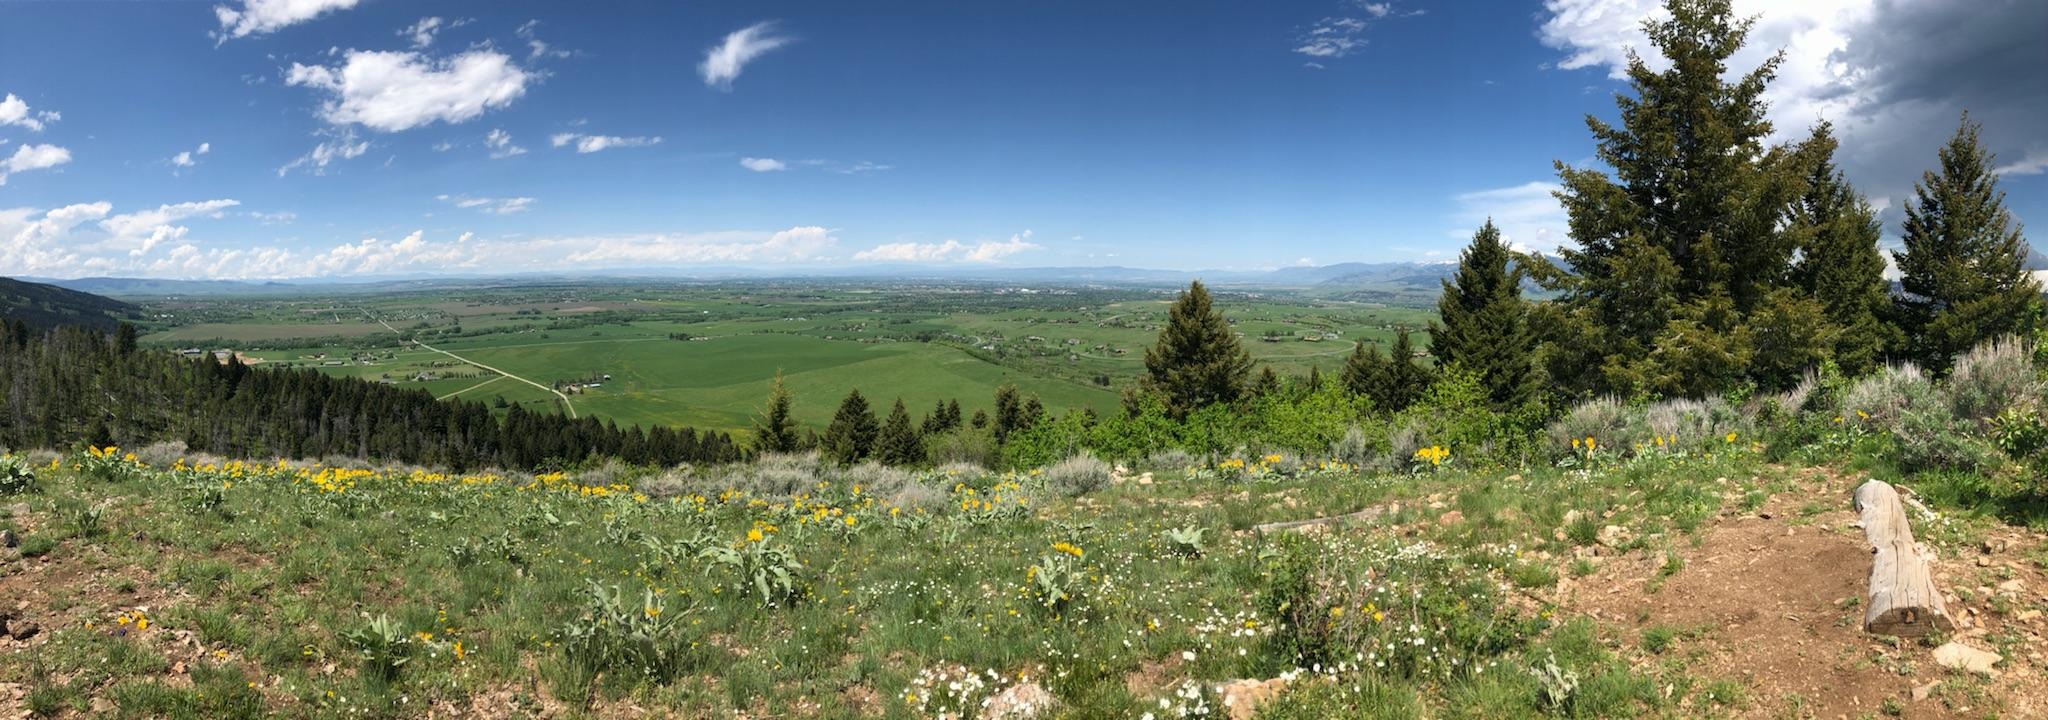 Triple Tree Trail in Bozeman, Montana